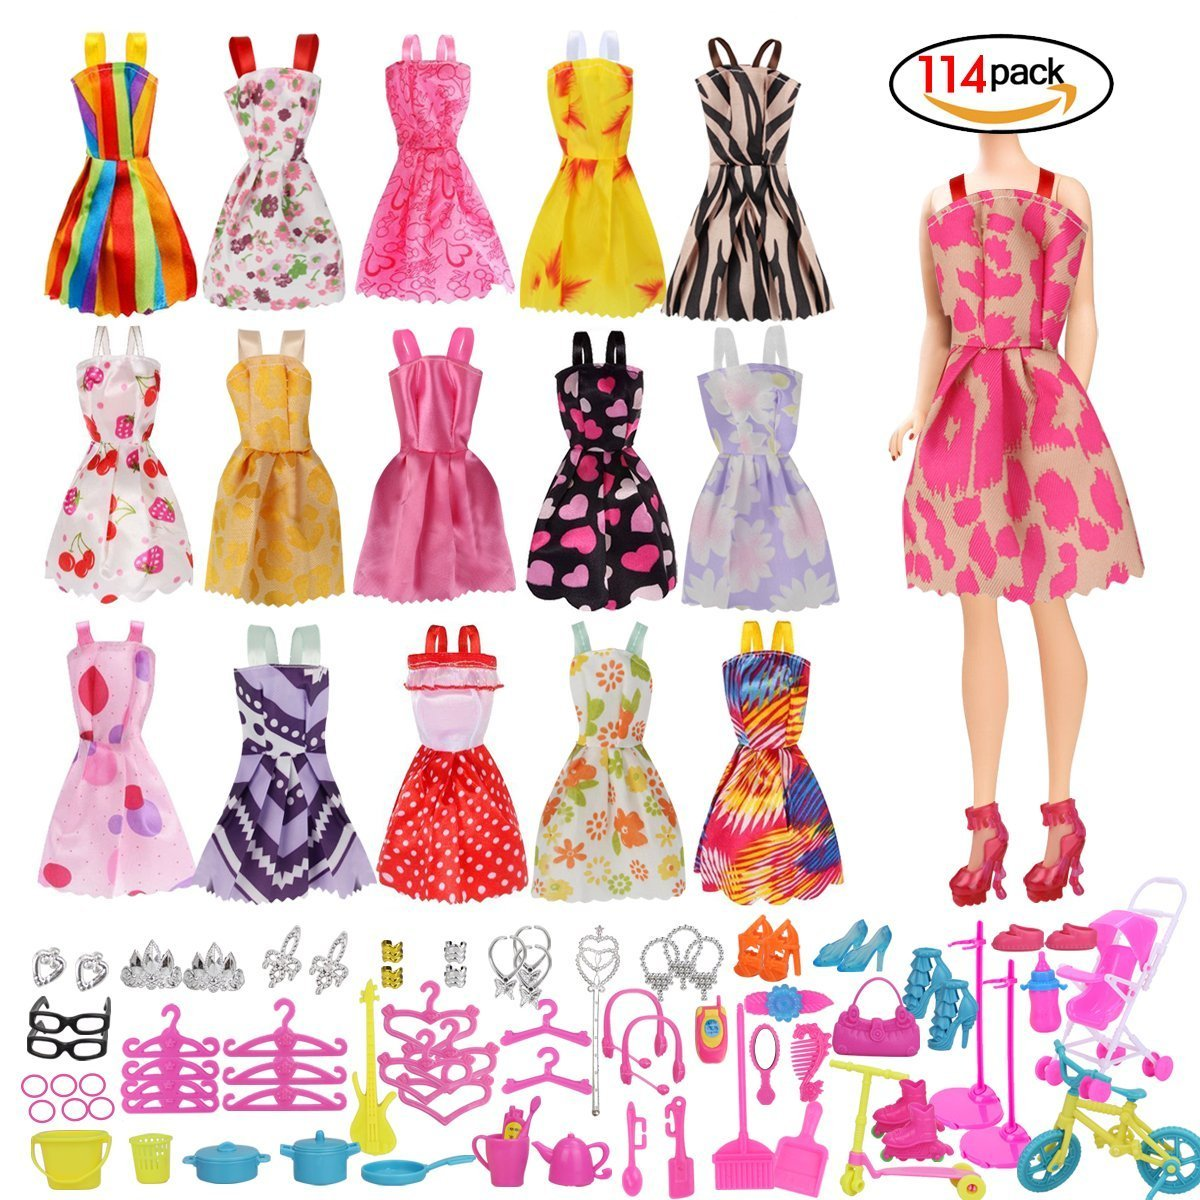 Zendaya Barbie Doll Amazon  drsarafraz